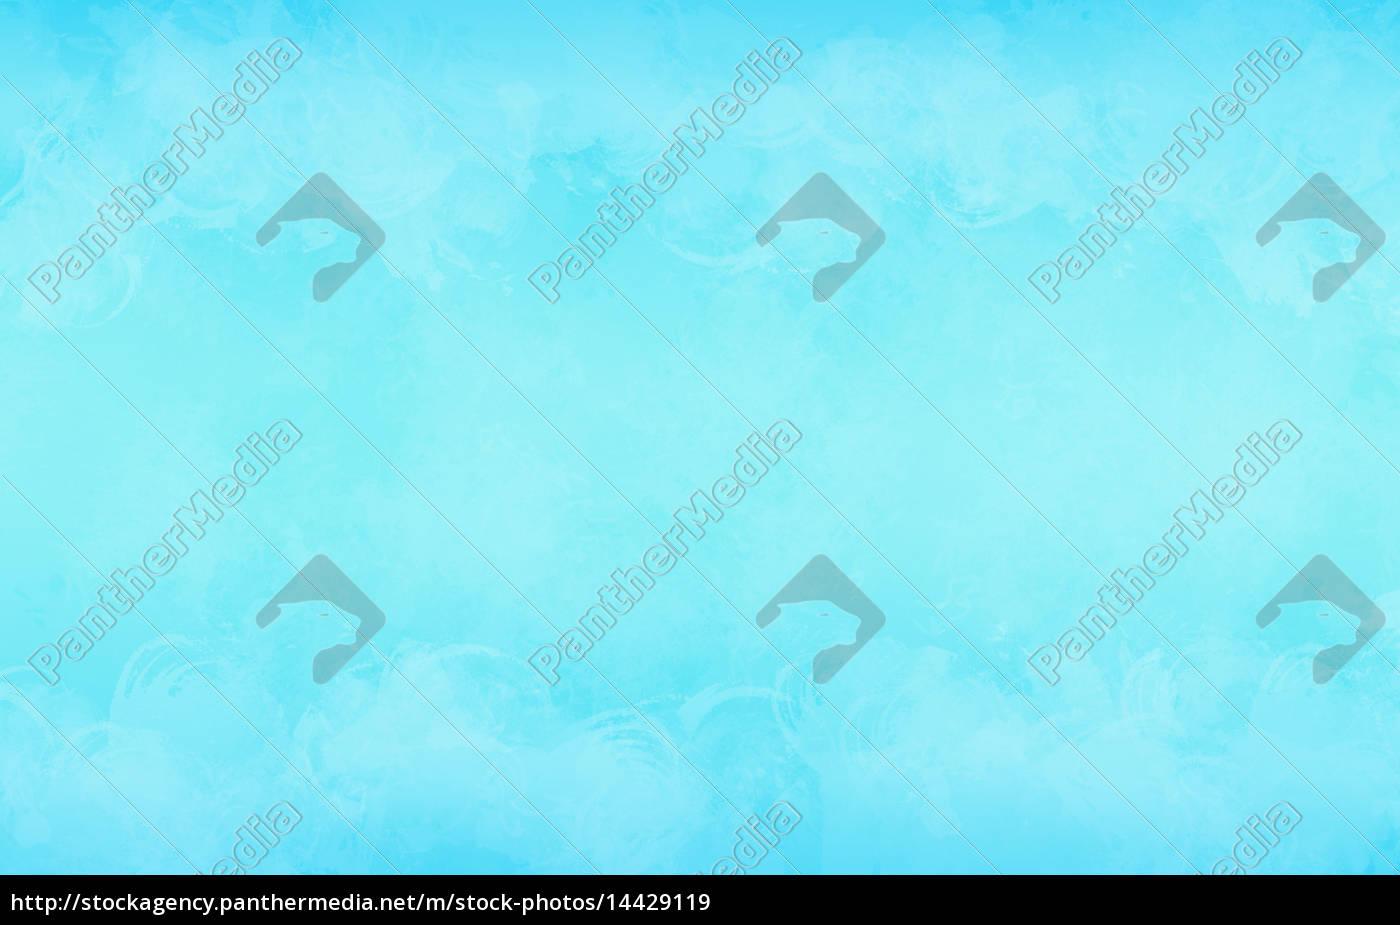 Lizenzfreies Bild 14429119 Abstract Blue Background Pattern